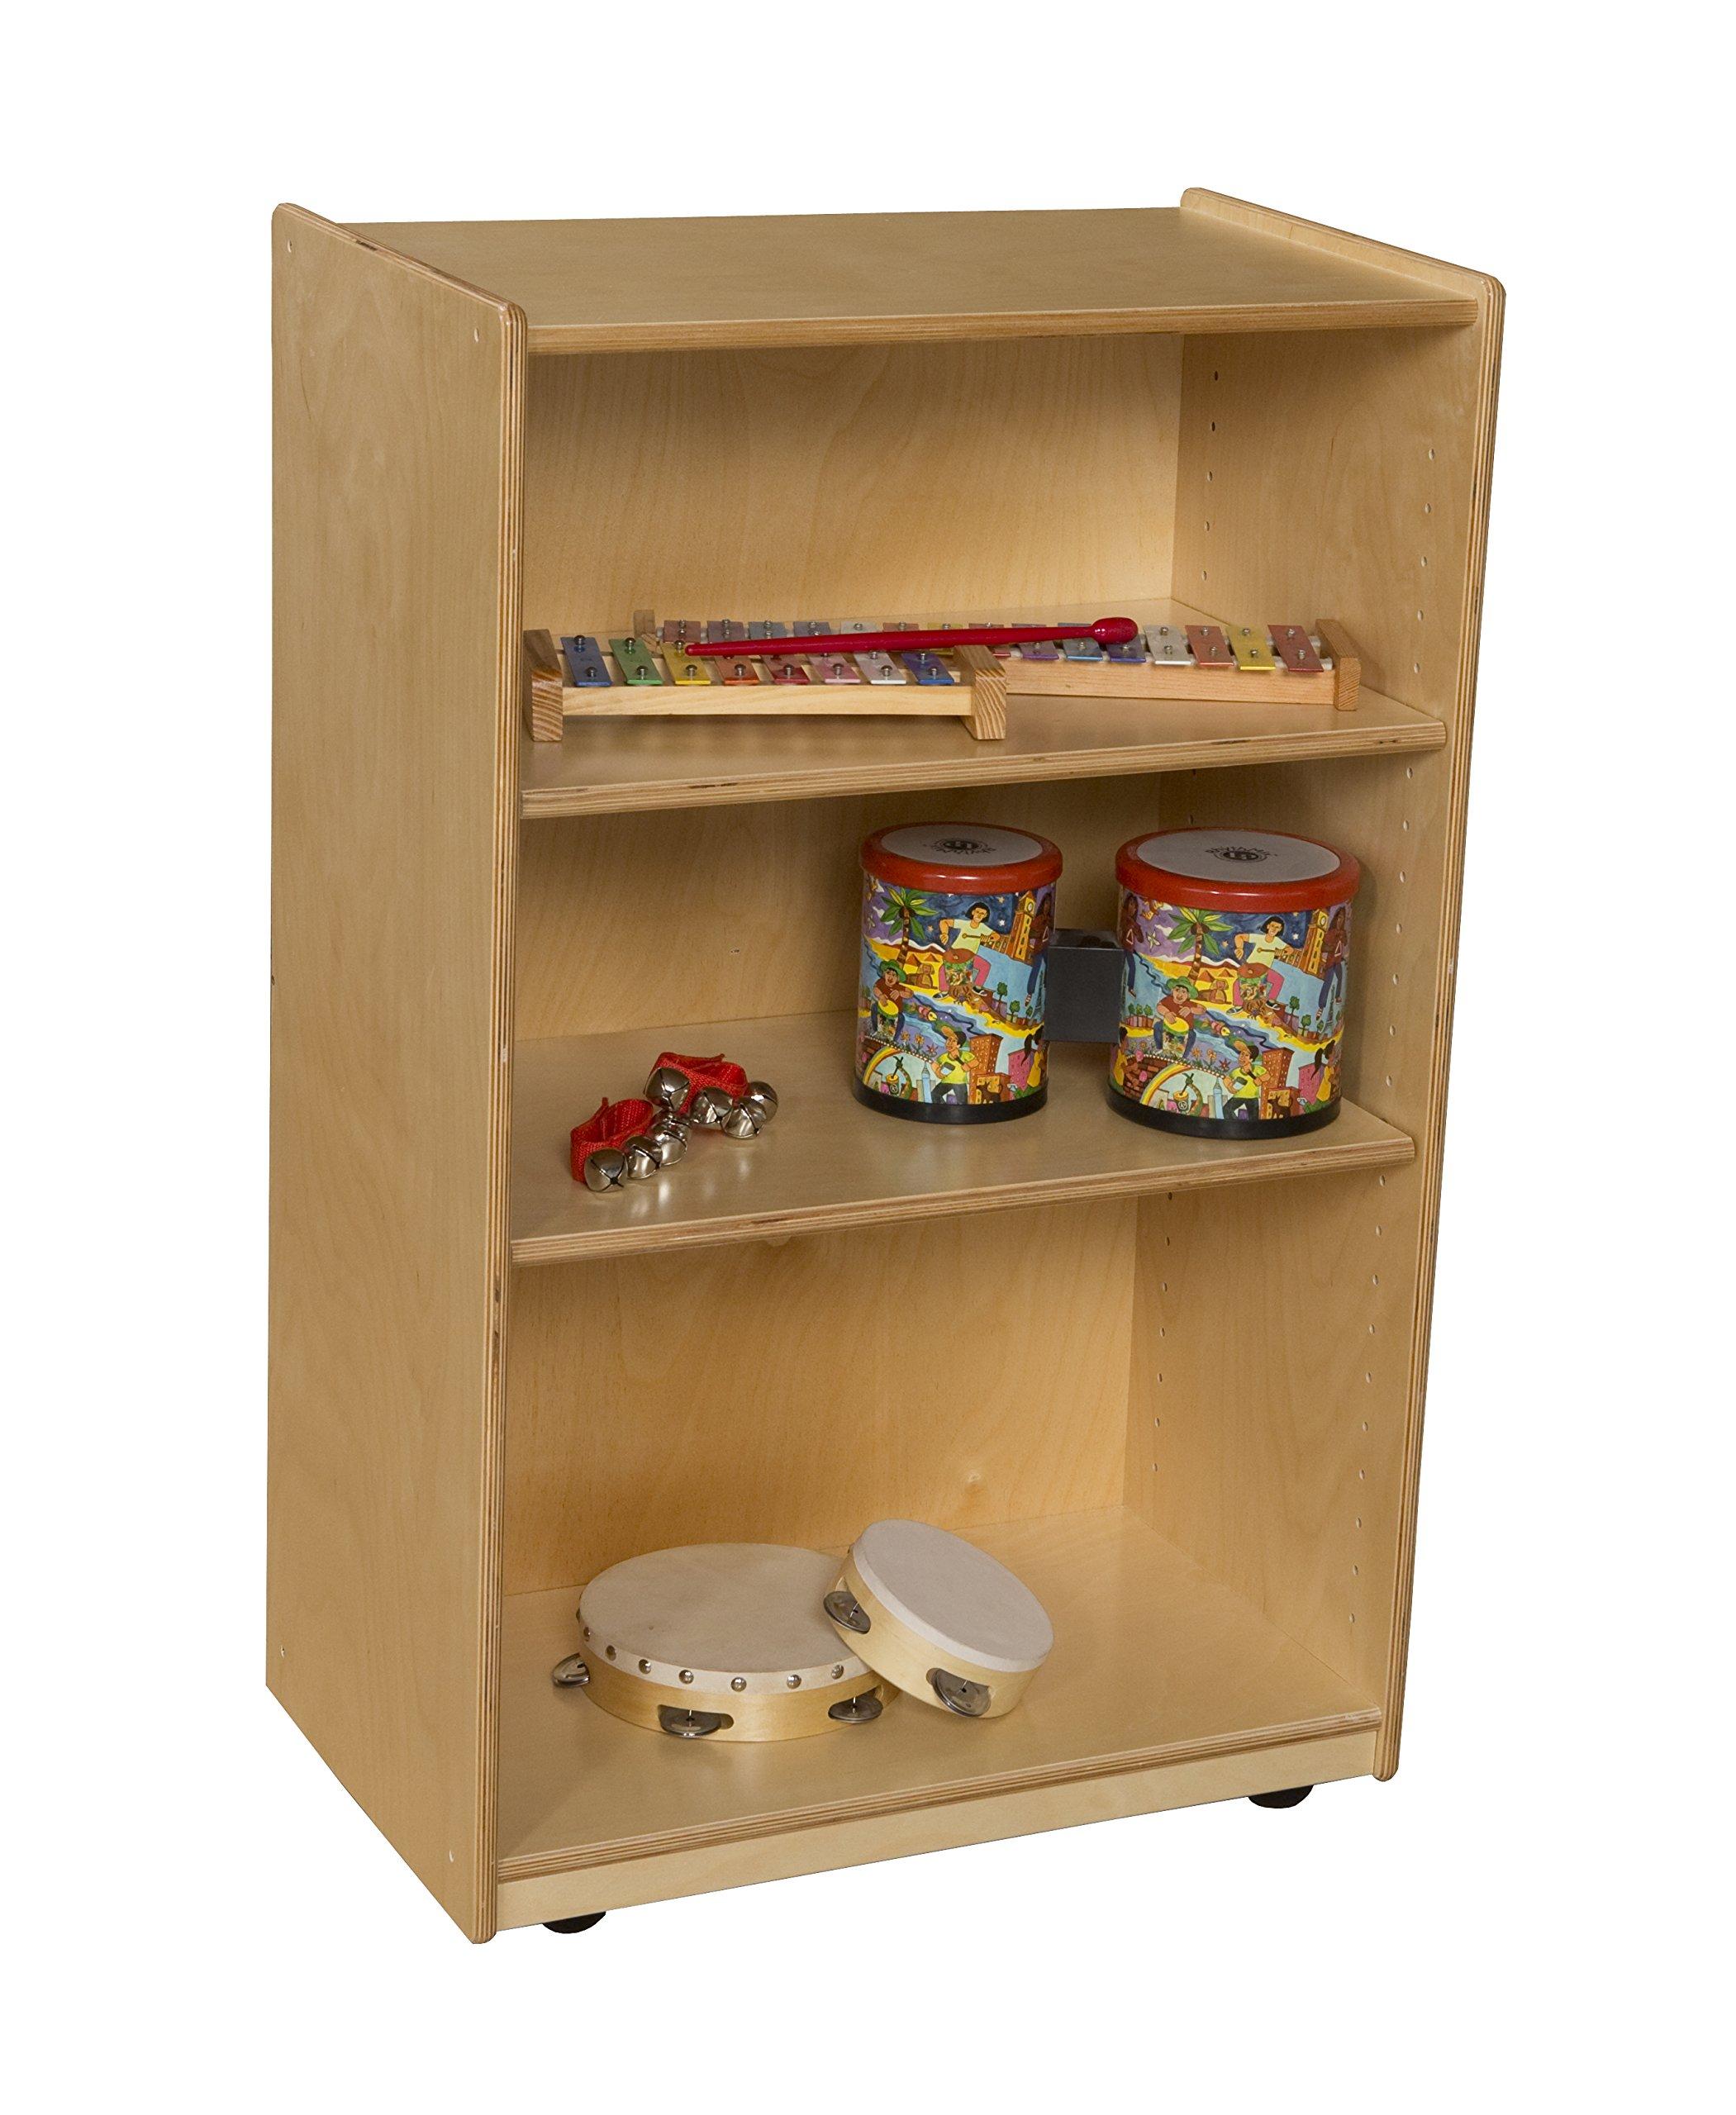 Wood Designs 25000AJ Storage Shelf with Adjustable Shelves